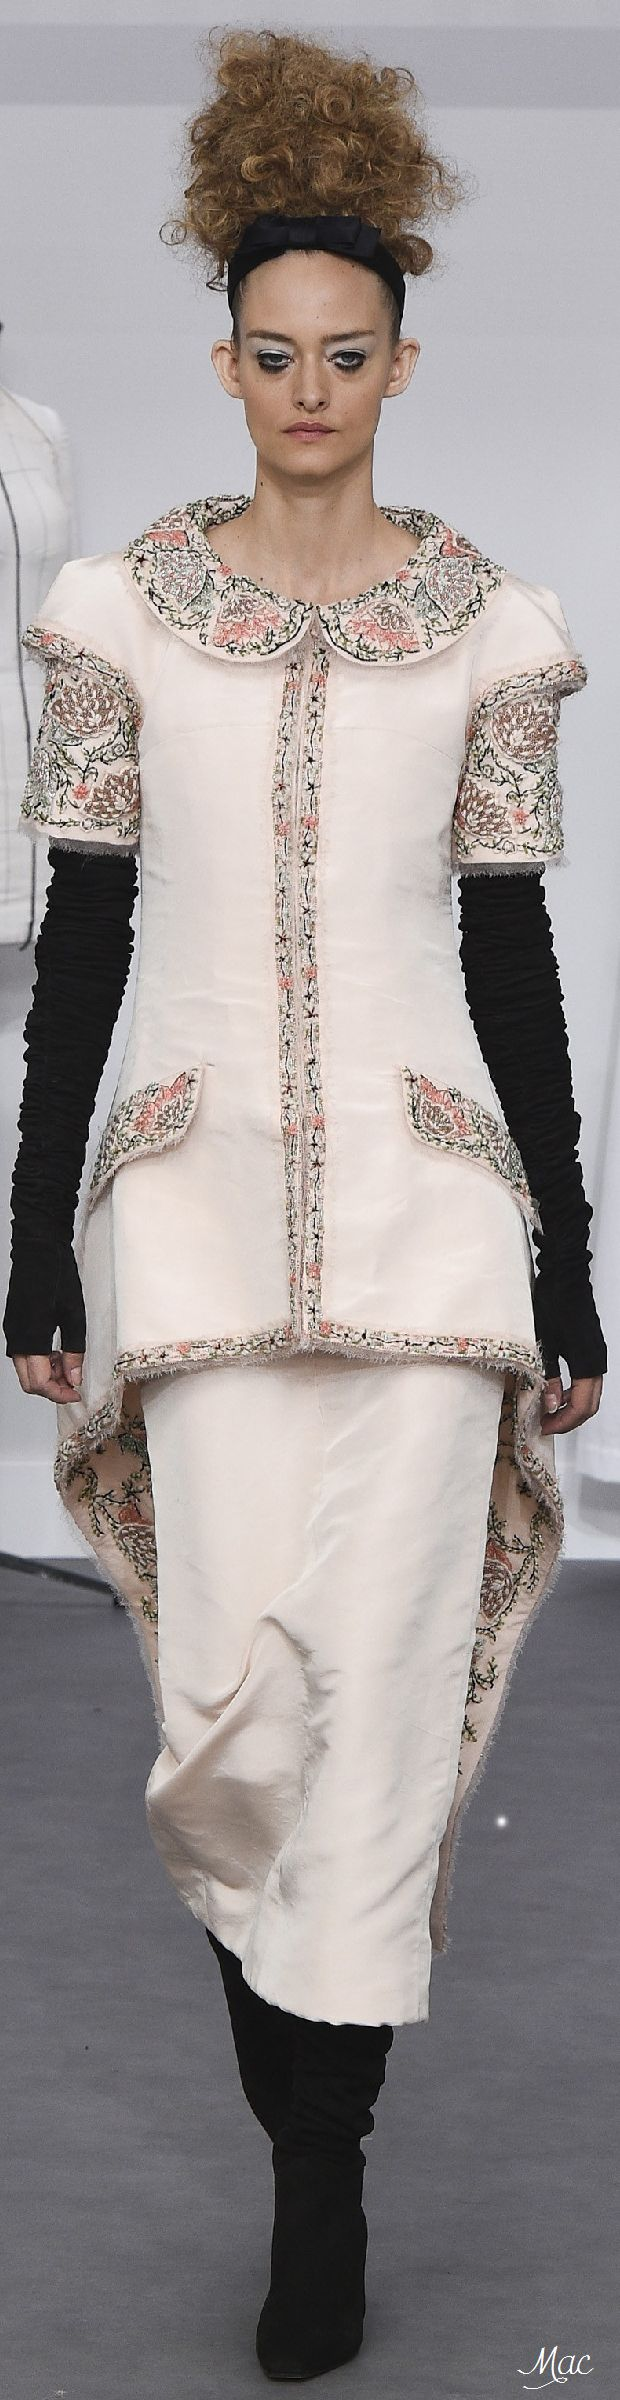 Fall 2016 Haute Couture - Chanel